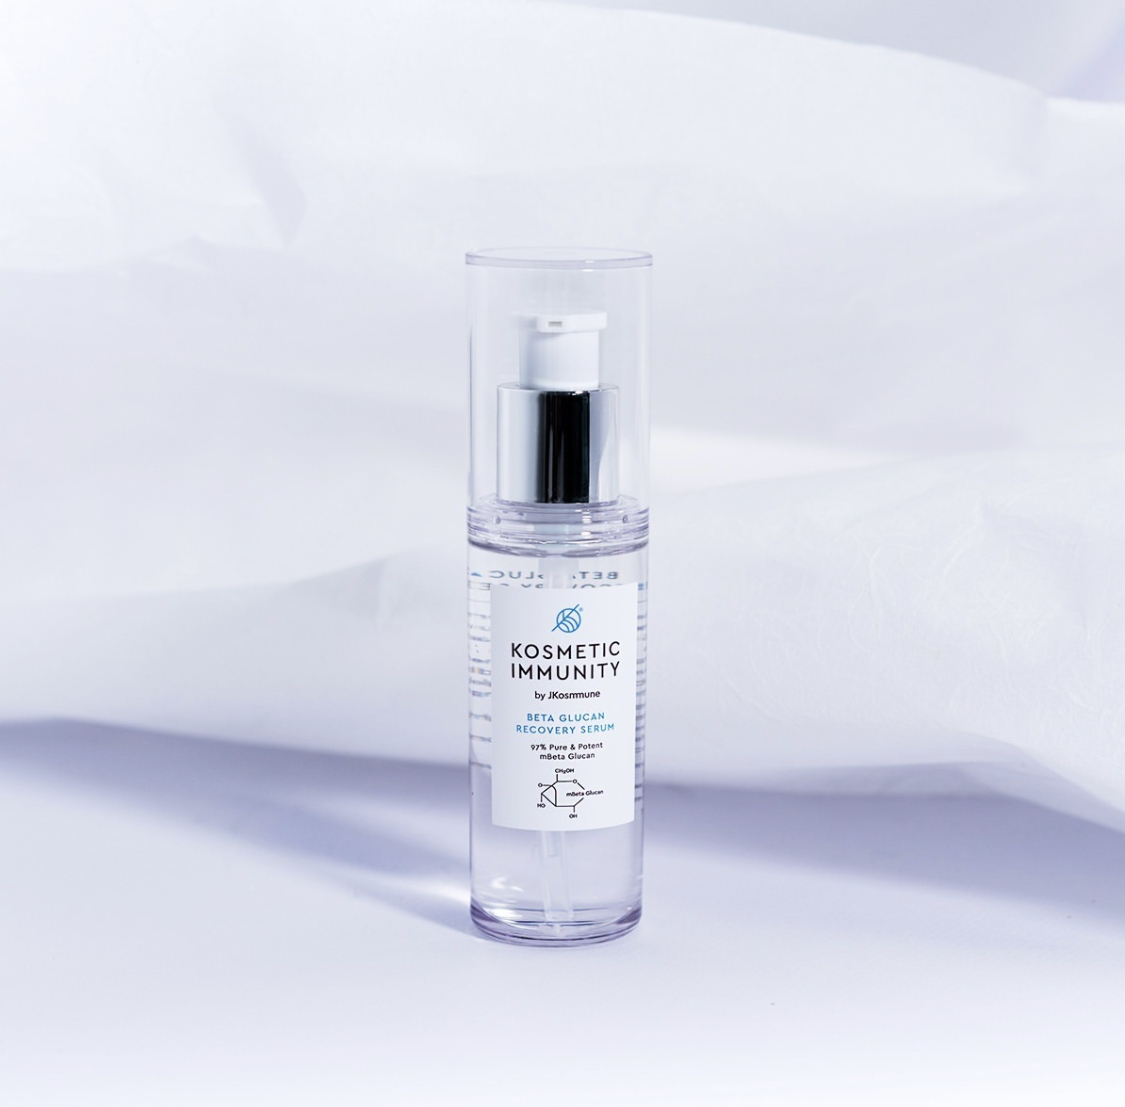 Kosmetic Immunity Beta Glucan Recovery Serum by Jkosmmune